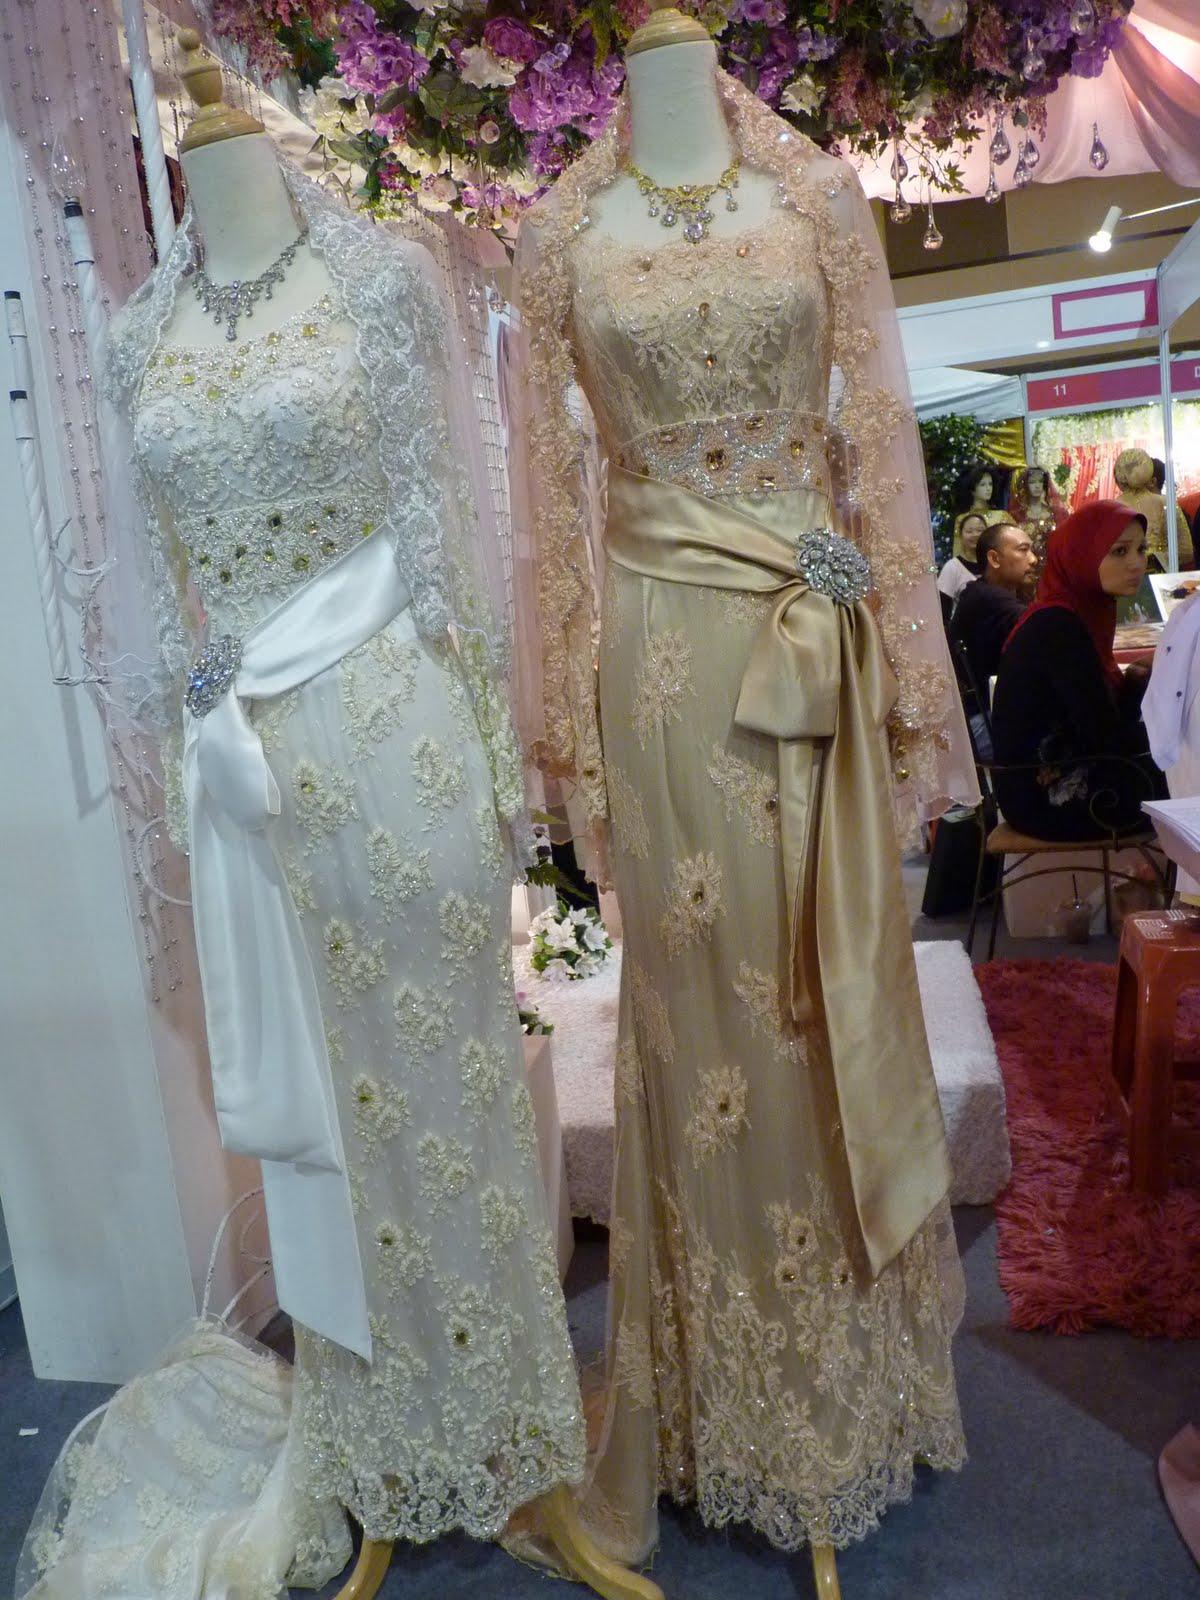 wedding dresses for sale malaysia wedding dresses